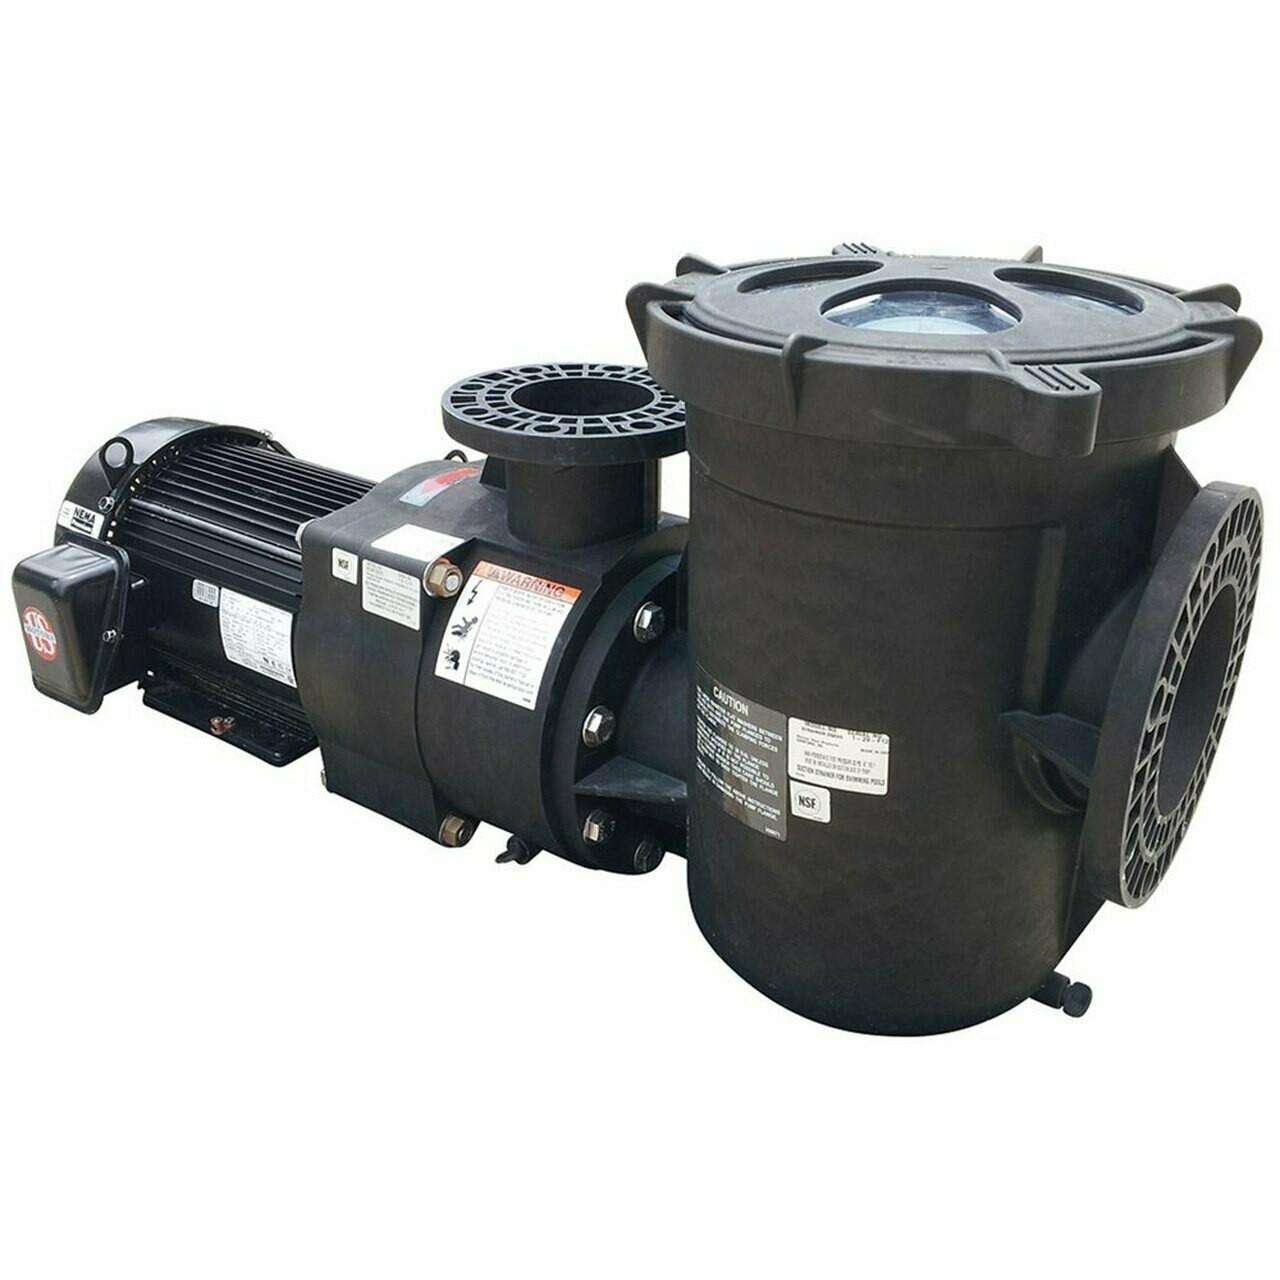 Pentair EQ Pump EQKT750 W/POT 7.5HP 208-230/460V 3PH TEFC Motor